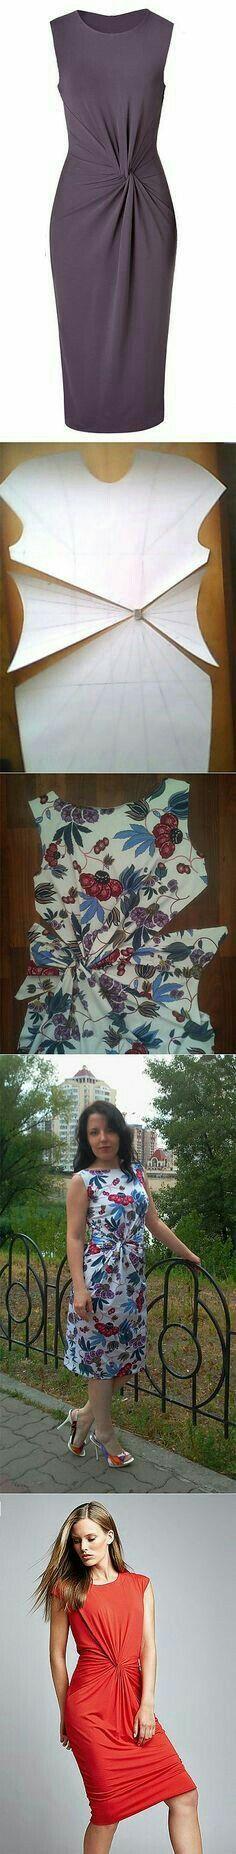 Best dress pattern sewing tips ideas Diy Clothing, Sewing Clothes, Clothing Patterns, Dress Patterns, Sewing Patterns, Pattern Dress, Fashion Sewing, Diy Fashion, Diy Vetement